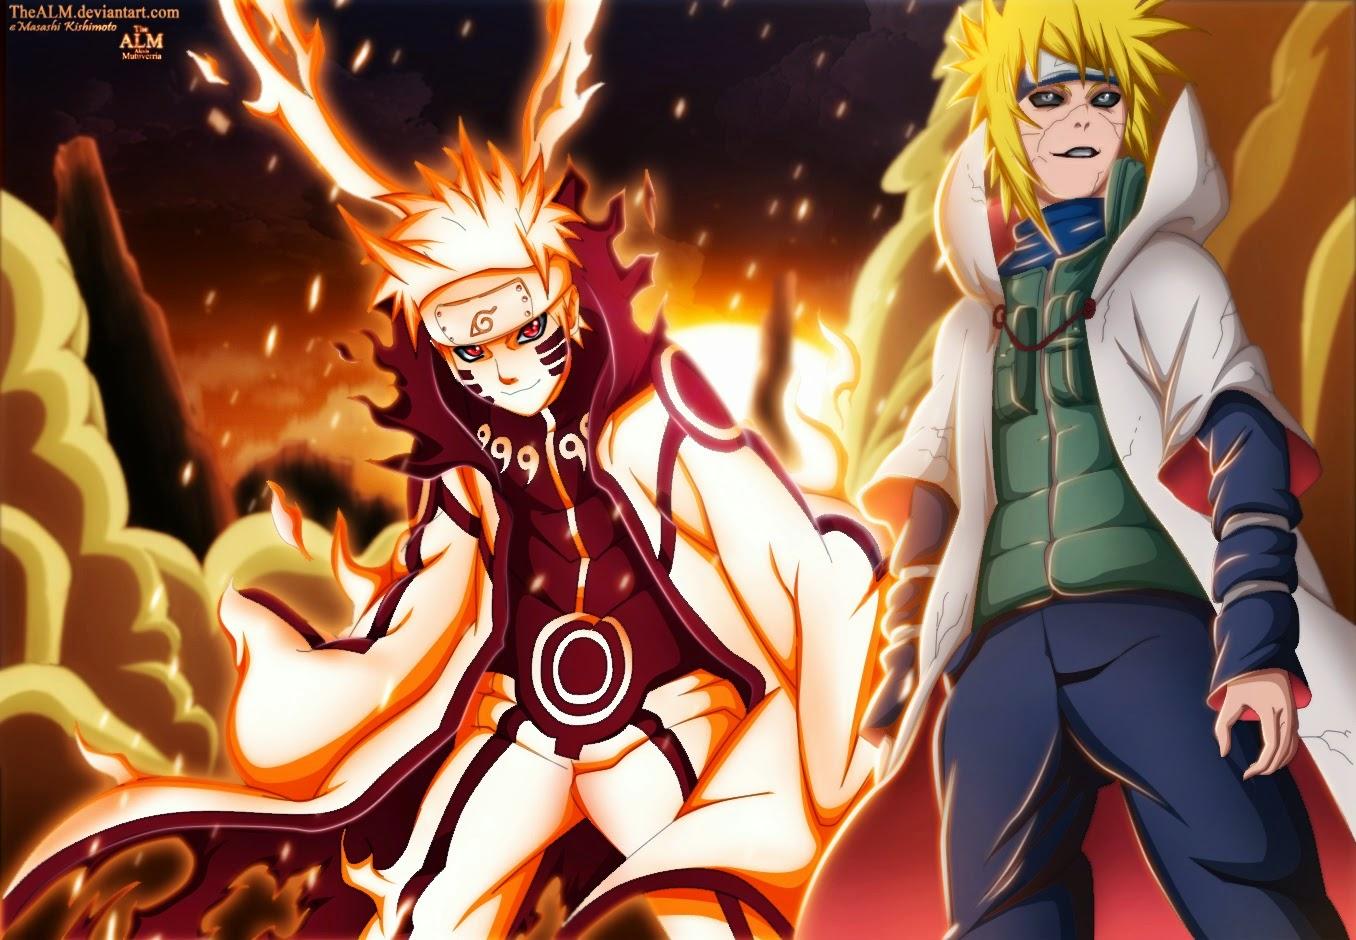 54 Koleksi Gambar Naruto Paling Keren Sedunia Gratis